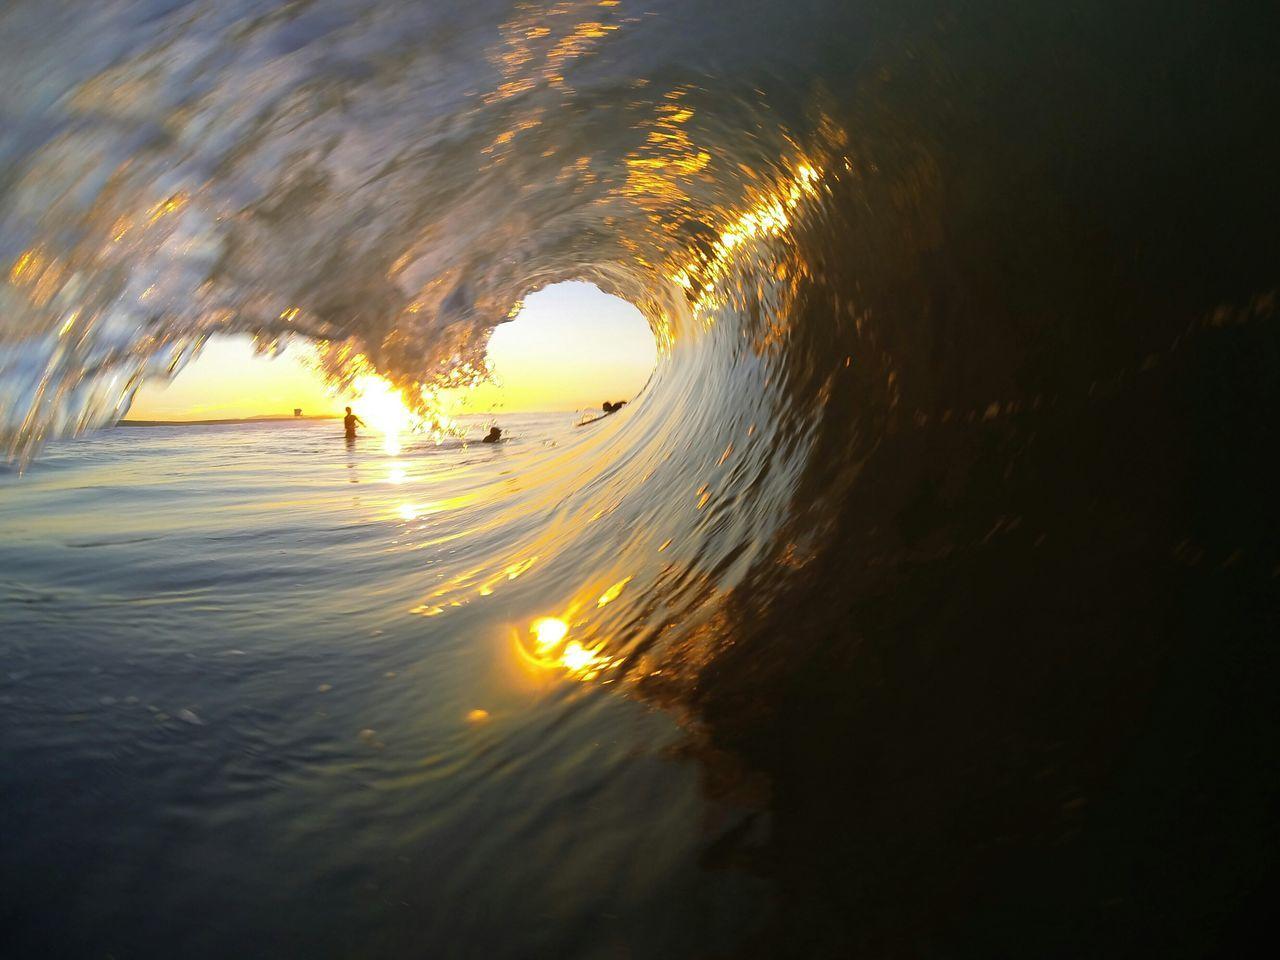 1/16/15 Toobsday Barrelsforbreakfast The Pursuit Of Happiness Surfing EyeEm_crew Tadaa Community Gopro Wars Bodysurfing Eat Sleep Surf Dawn Patrol